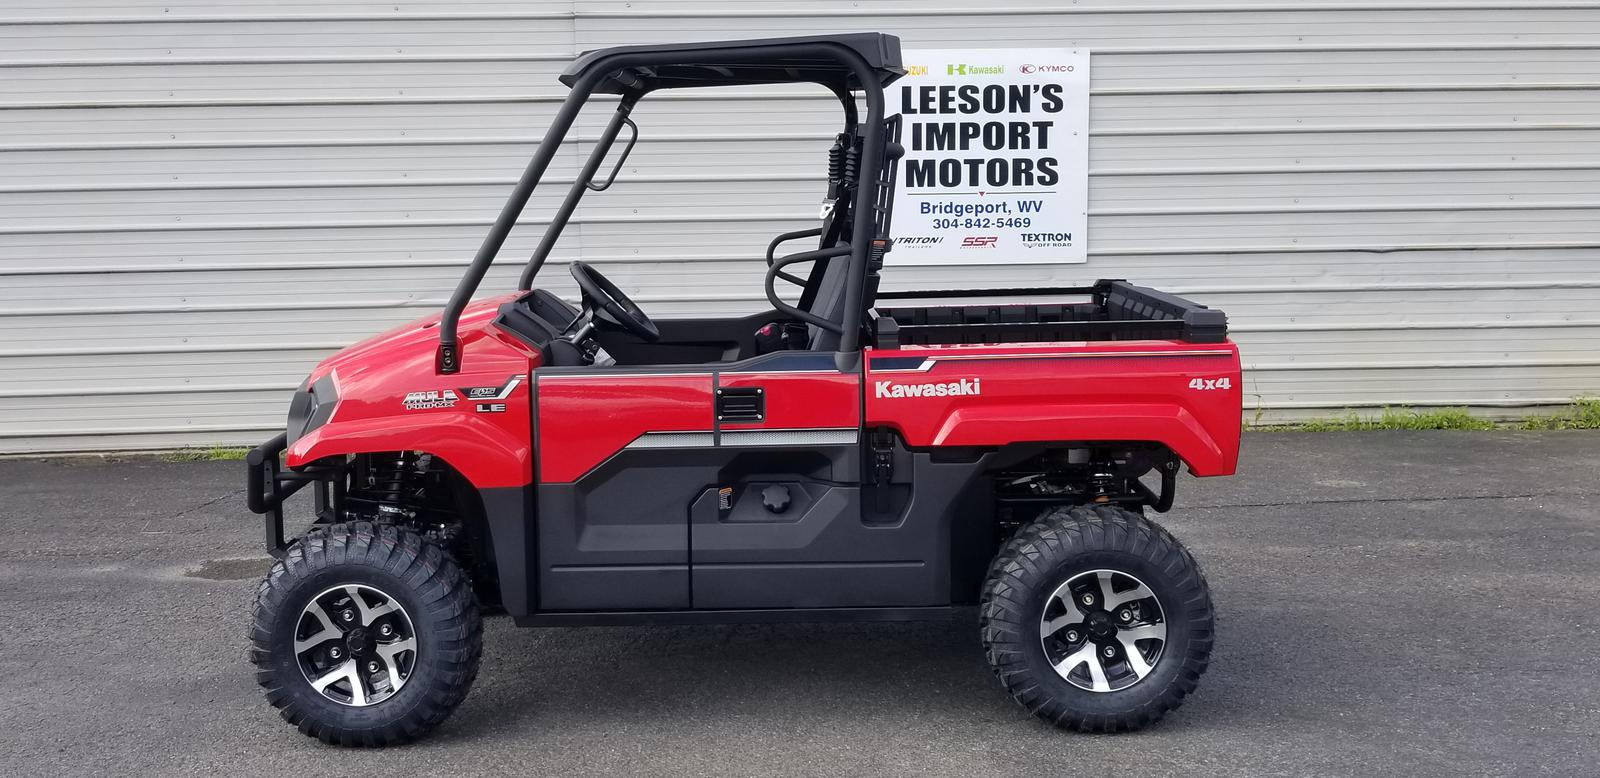 Side x Side Leeson's Import Motors Bridgeport, WV (844) 533-7667